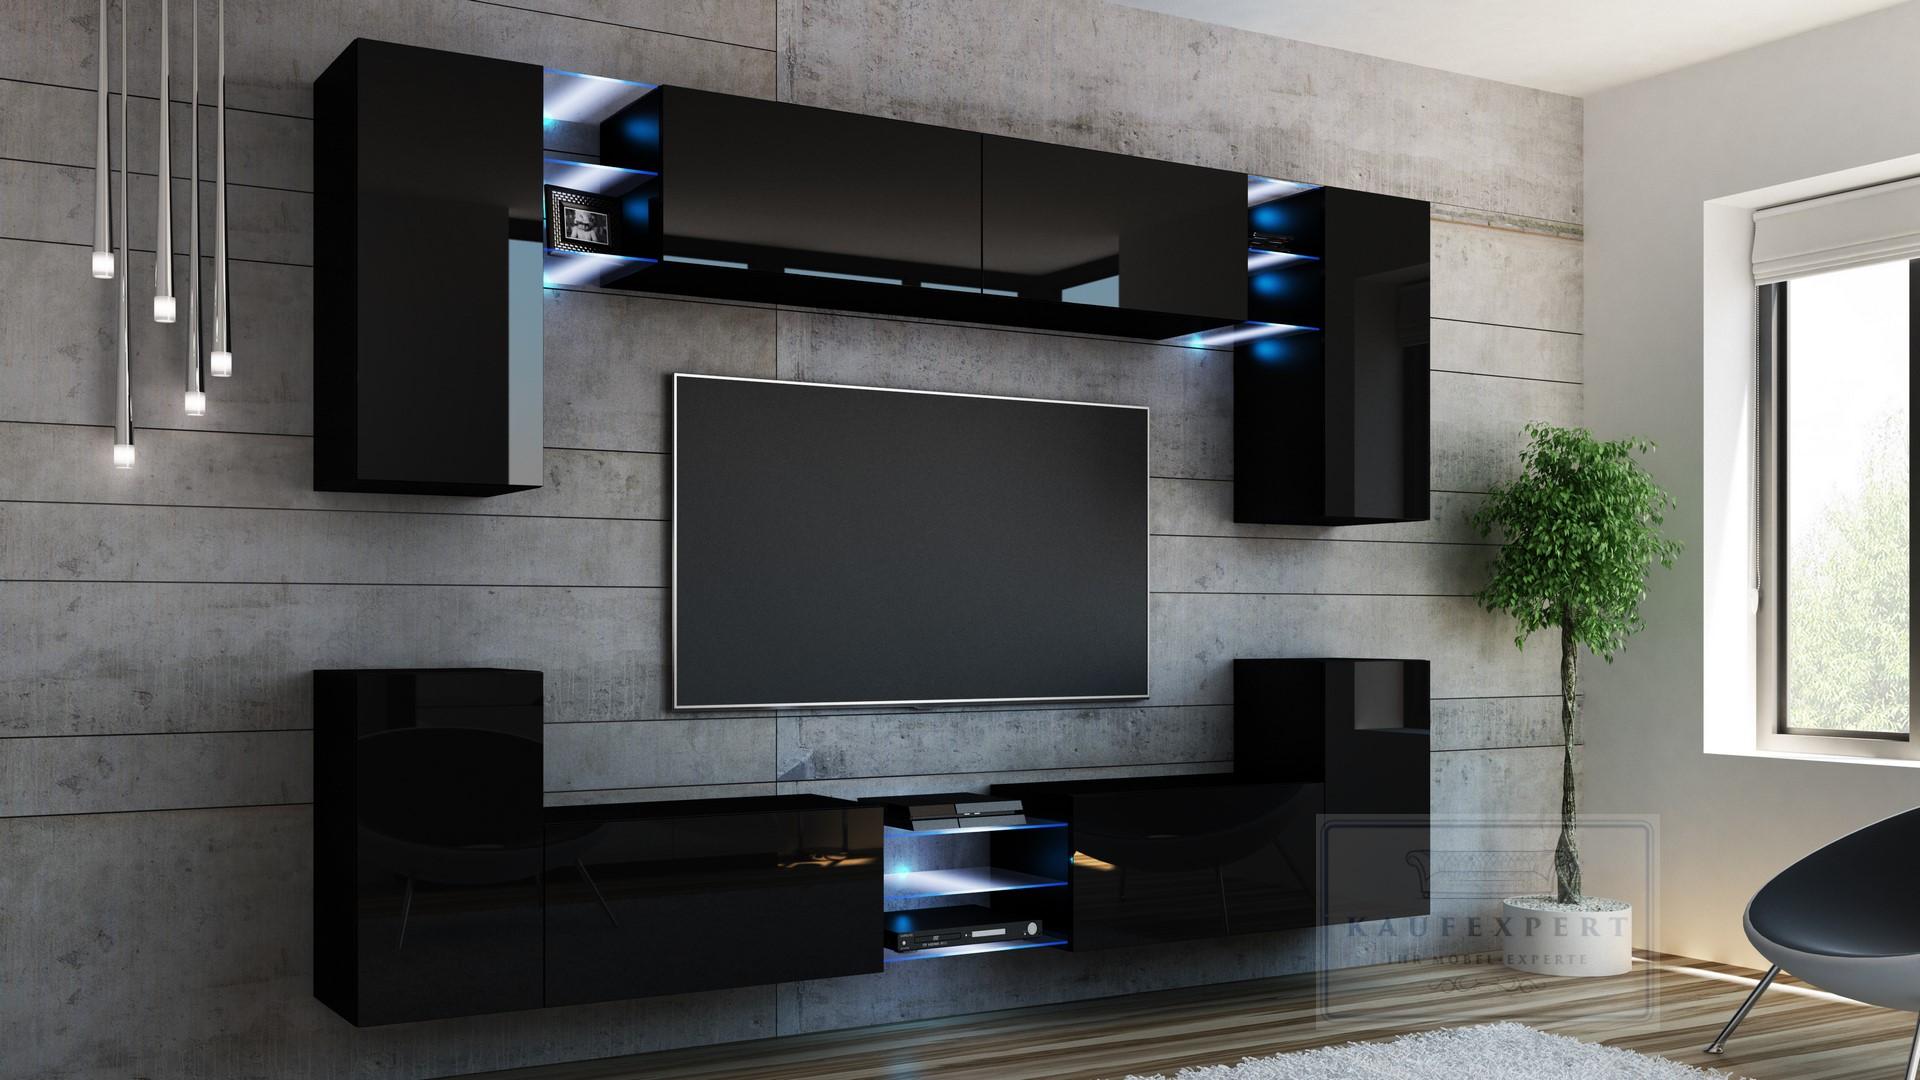 wohnwand galaxy schwarz hochglanz led beleuchtung anbauwand mediawand design ebay. Black Bedroom Furniture Sets. Home Design Ideas